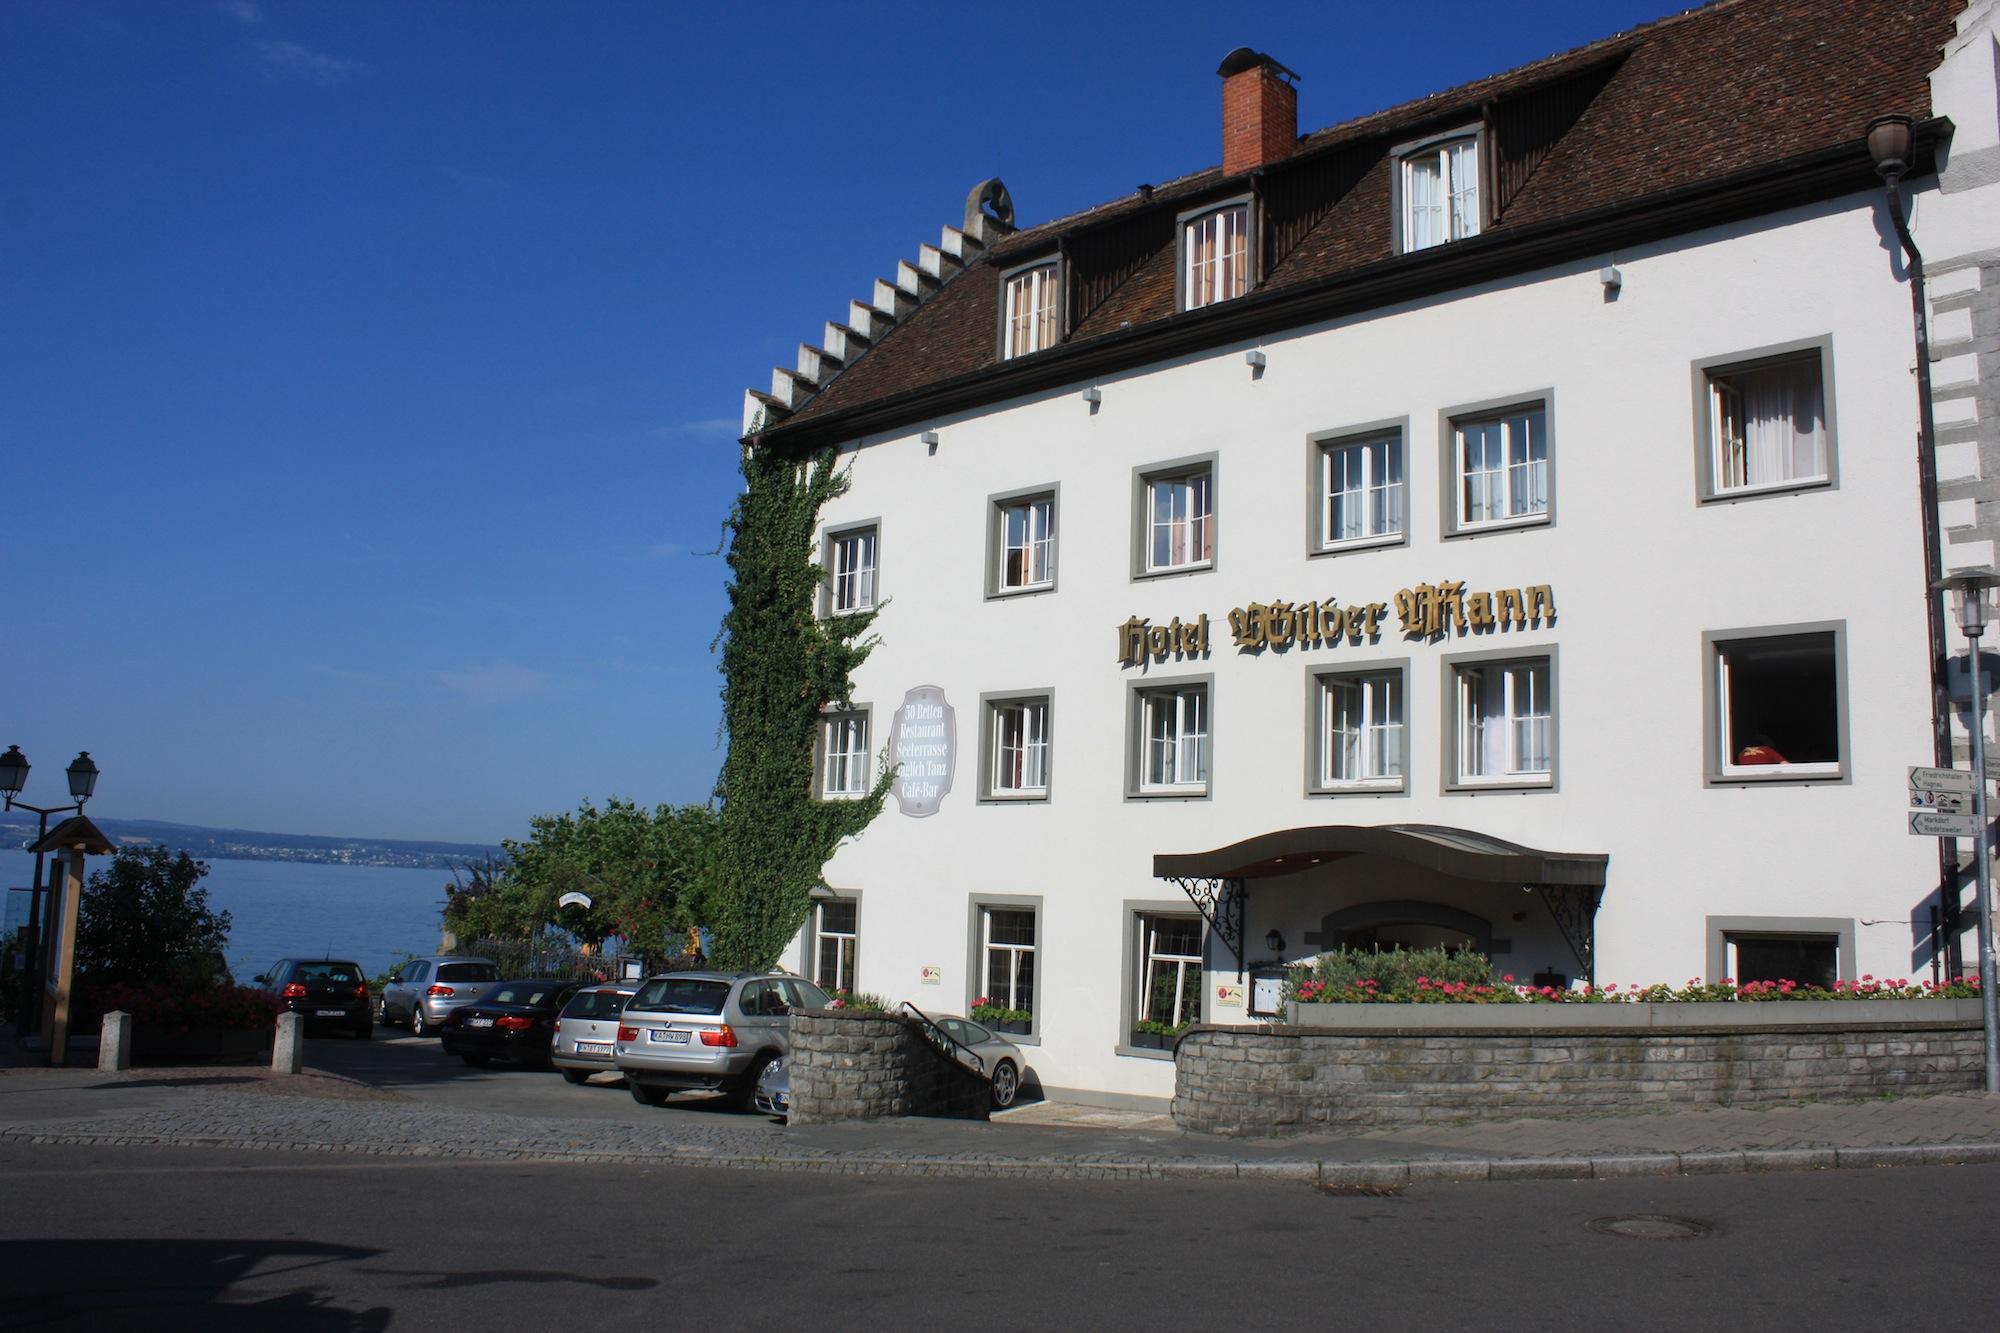 HotelWilderMann